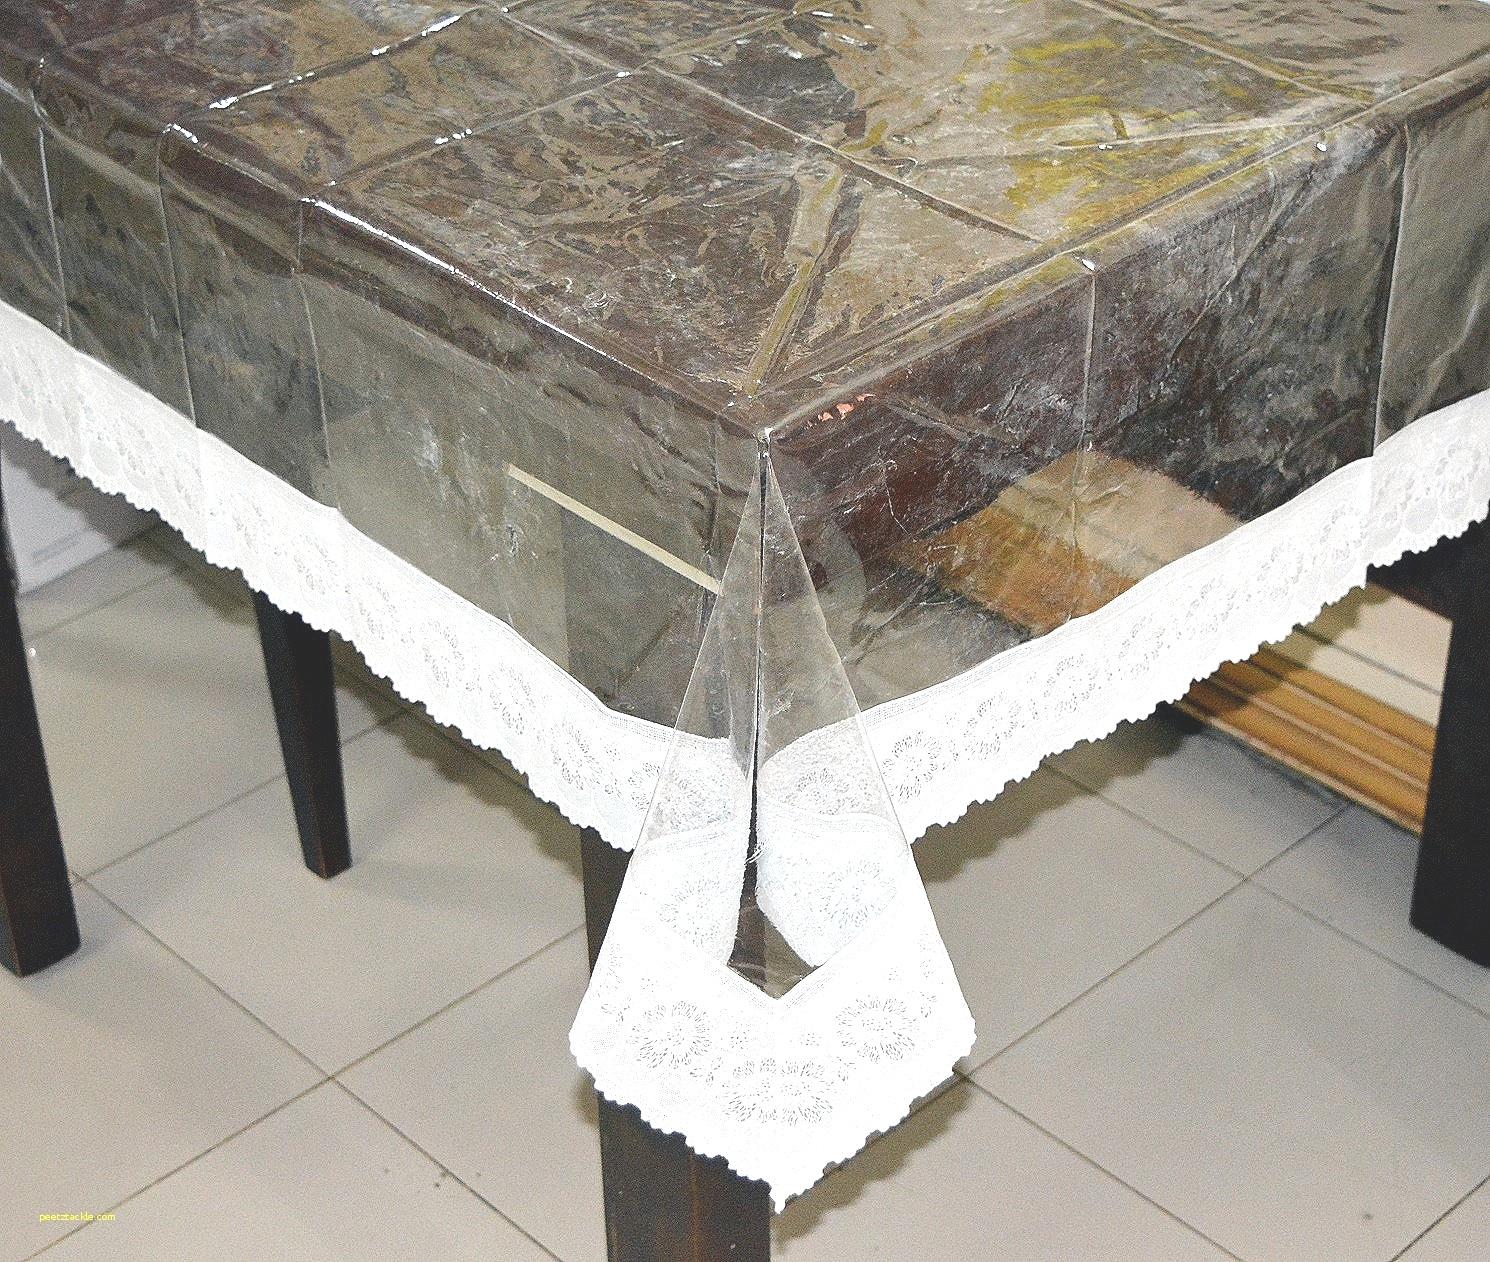 White Oval Tablecloths 60 X 120 | Tablecloth Pottery Barn Tablecloths Dresser Nner Modern Fall Table ..